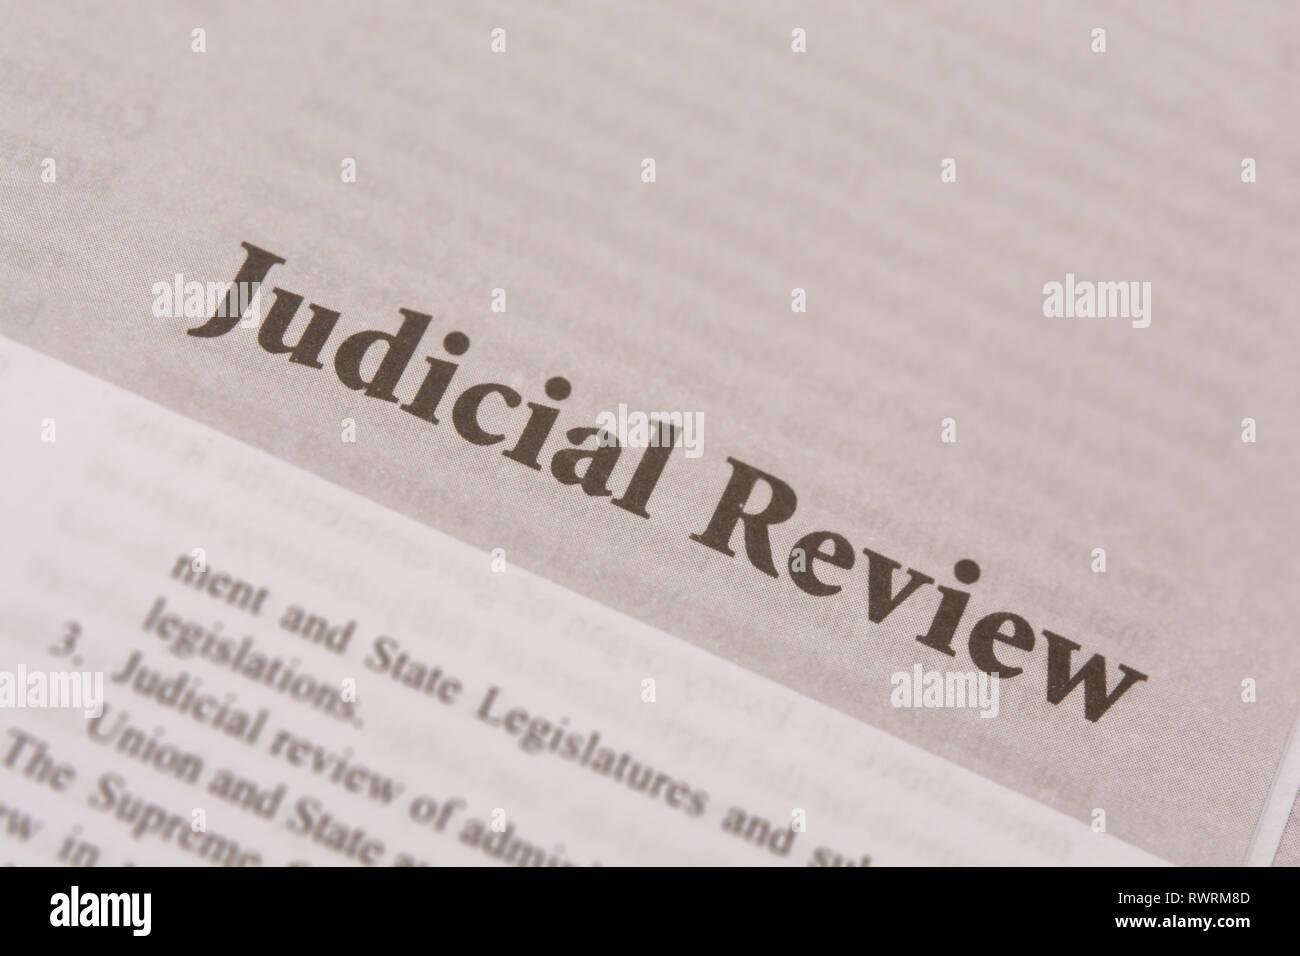 Maski,Karnataka,India - JANUARY,09,2019 : Judicial review printed on paper. - Stock Image